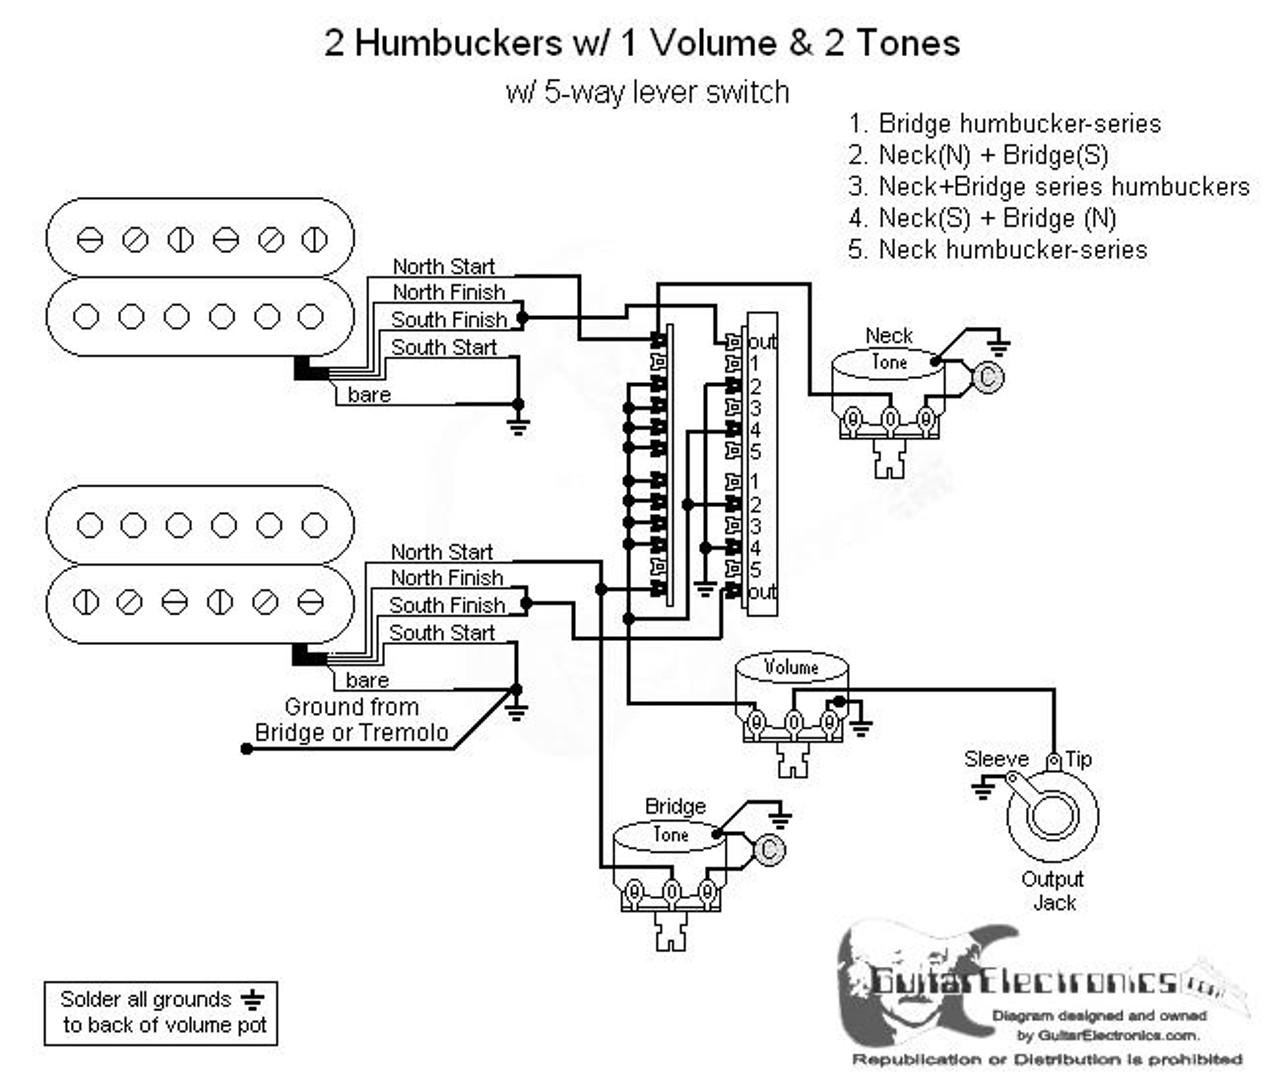 2 humbuckers 5 way lever switch 1 volume 2 tones 05two humbucker 5 way switch wiring [ 1280 x 1083 Pixel ]